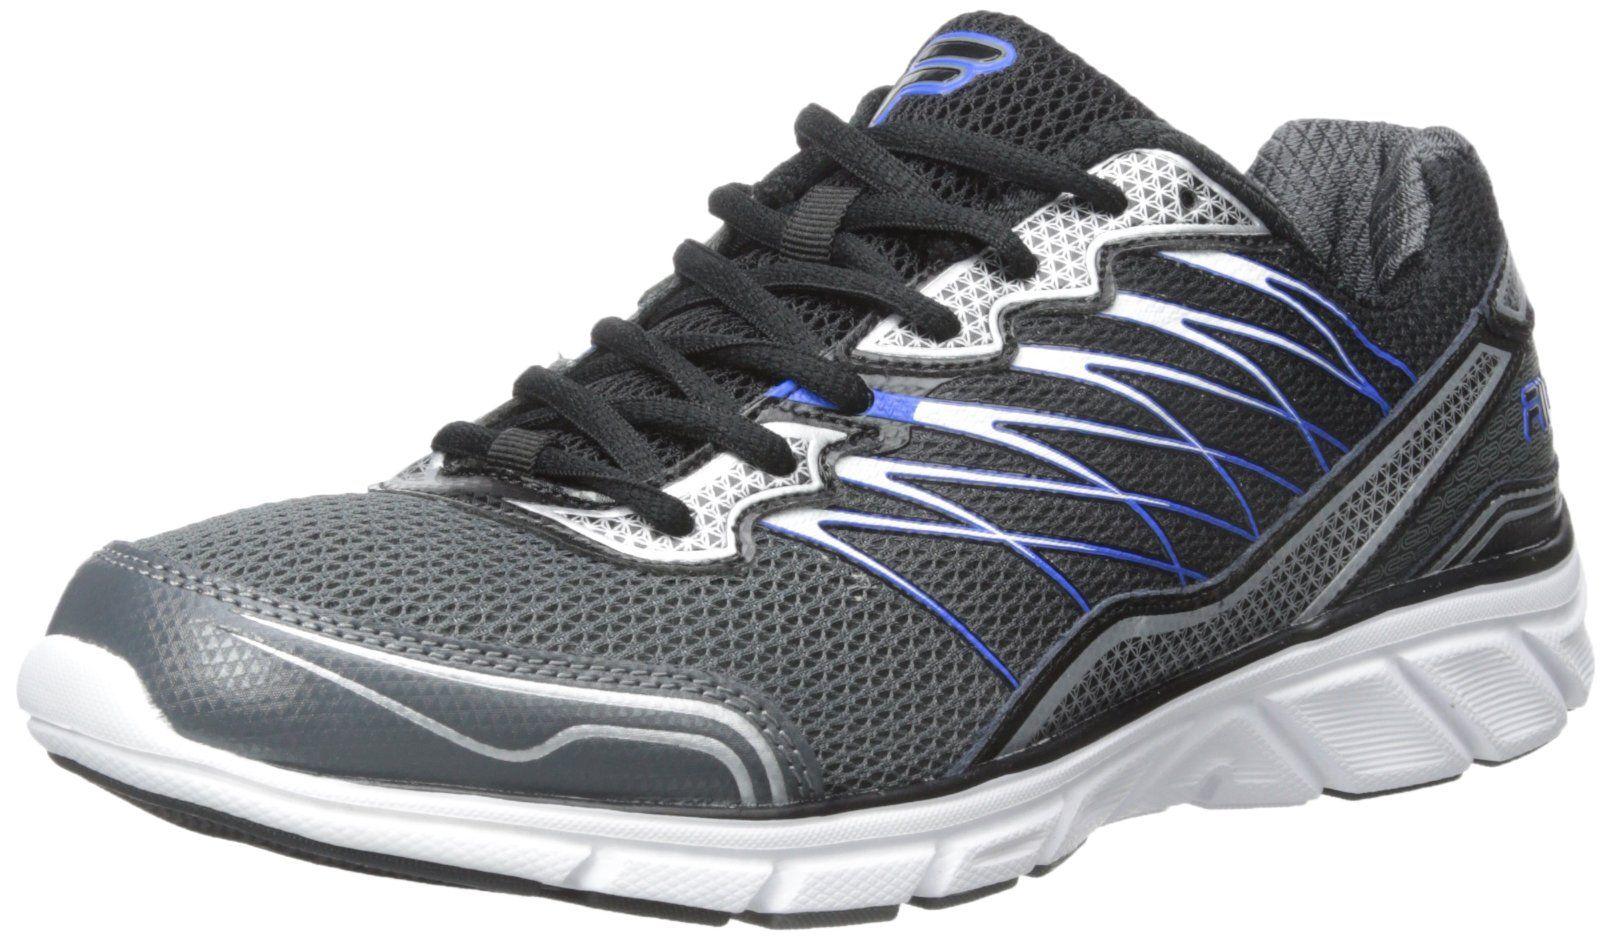 Fila Men's Countdown 2-m Running Shoe, Castlerock/Black/Prince Blue,